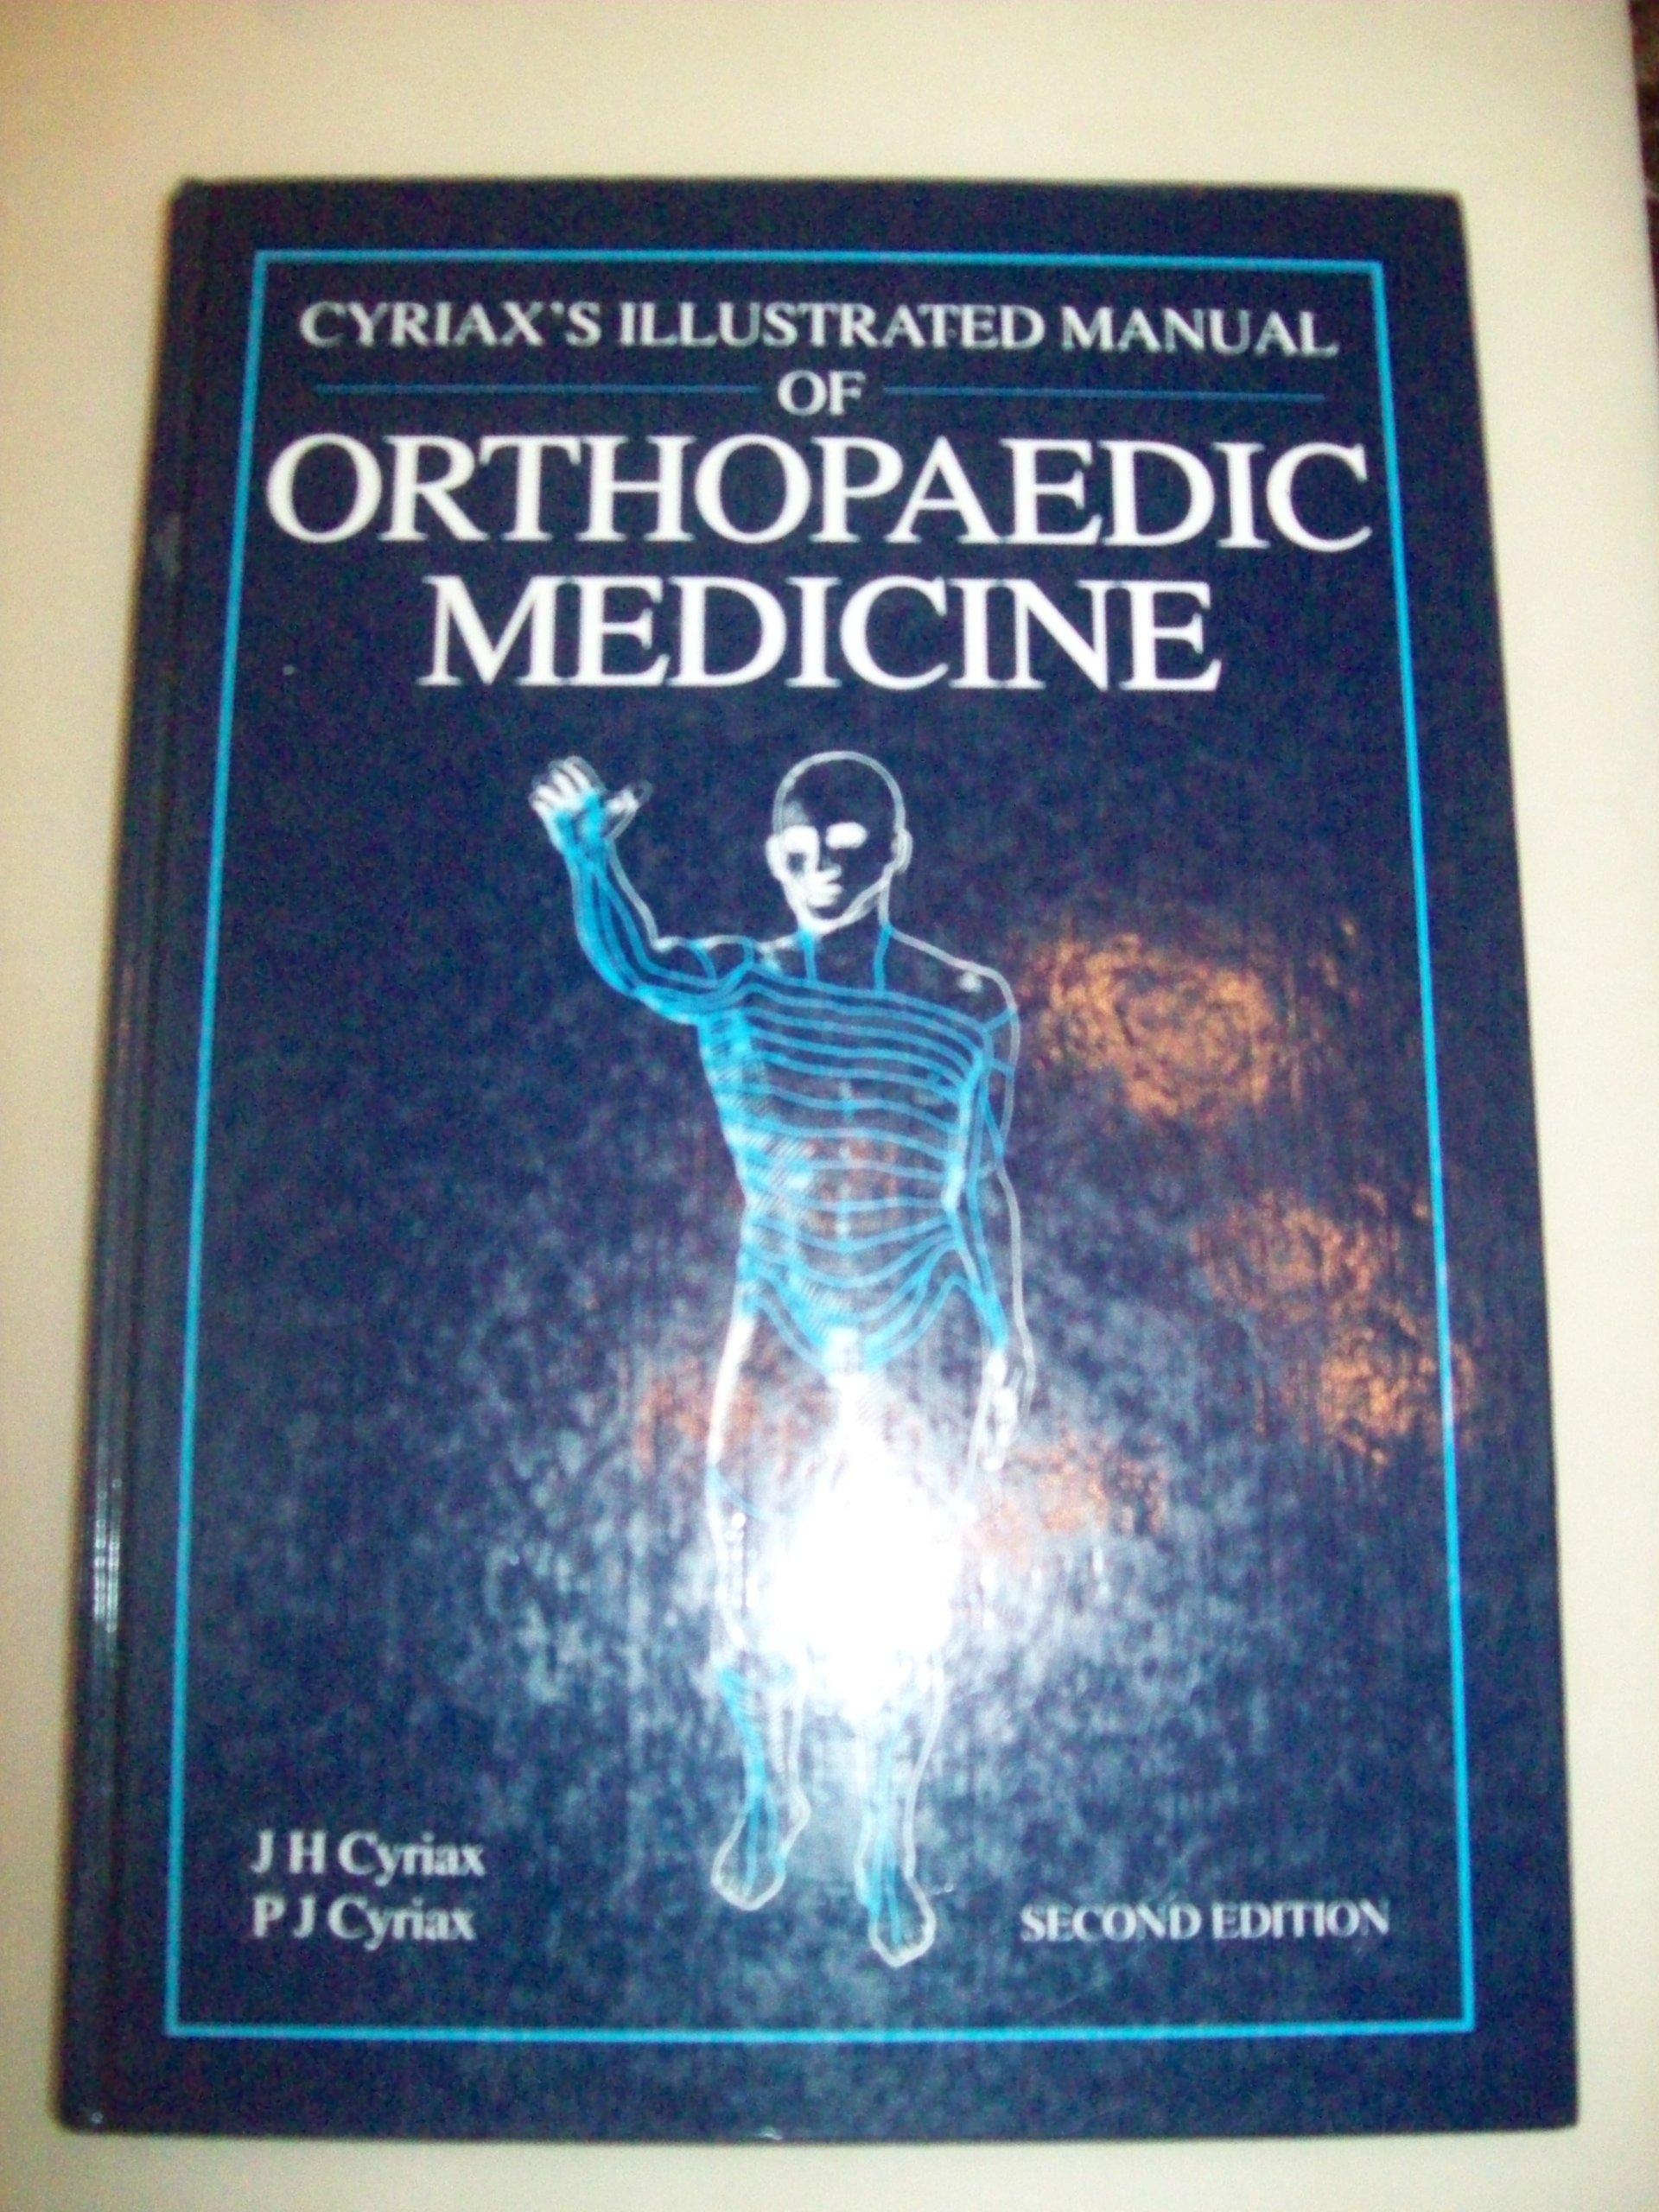 Cyriax textbook of orthopaedic medicine yahoo